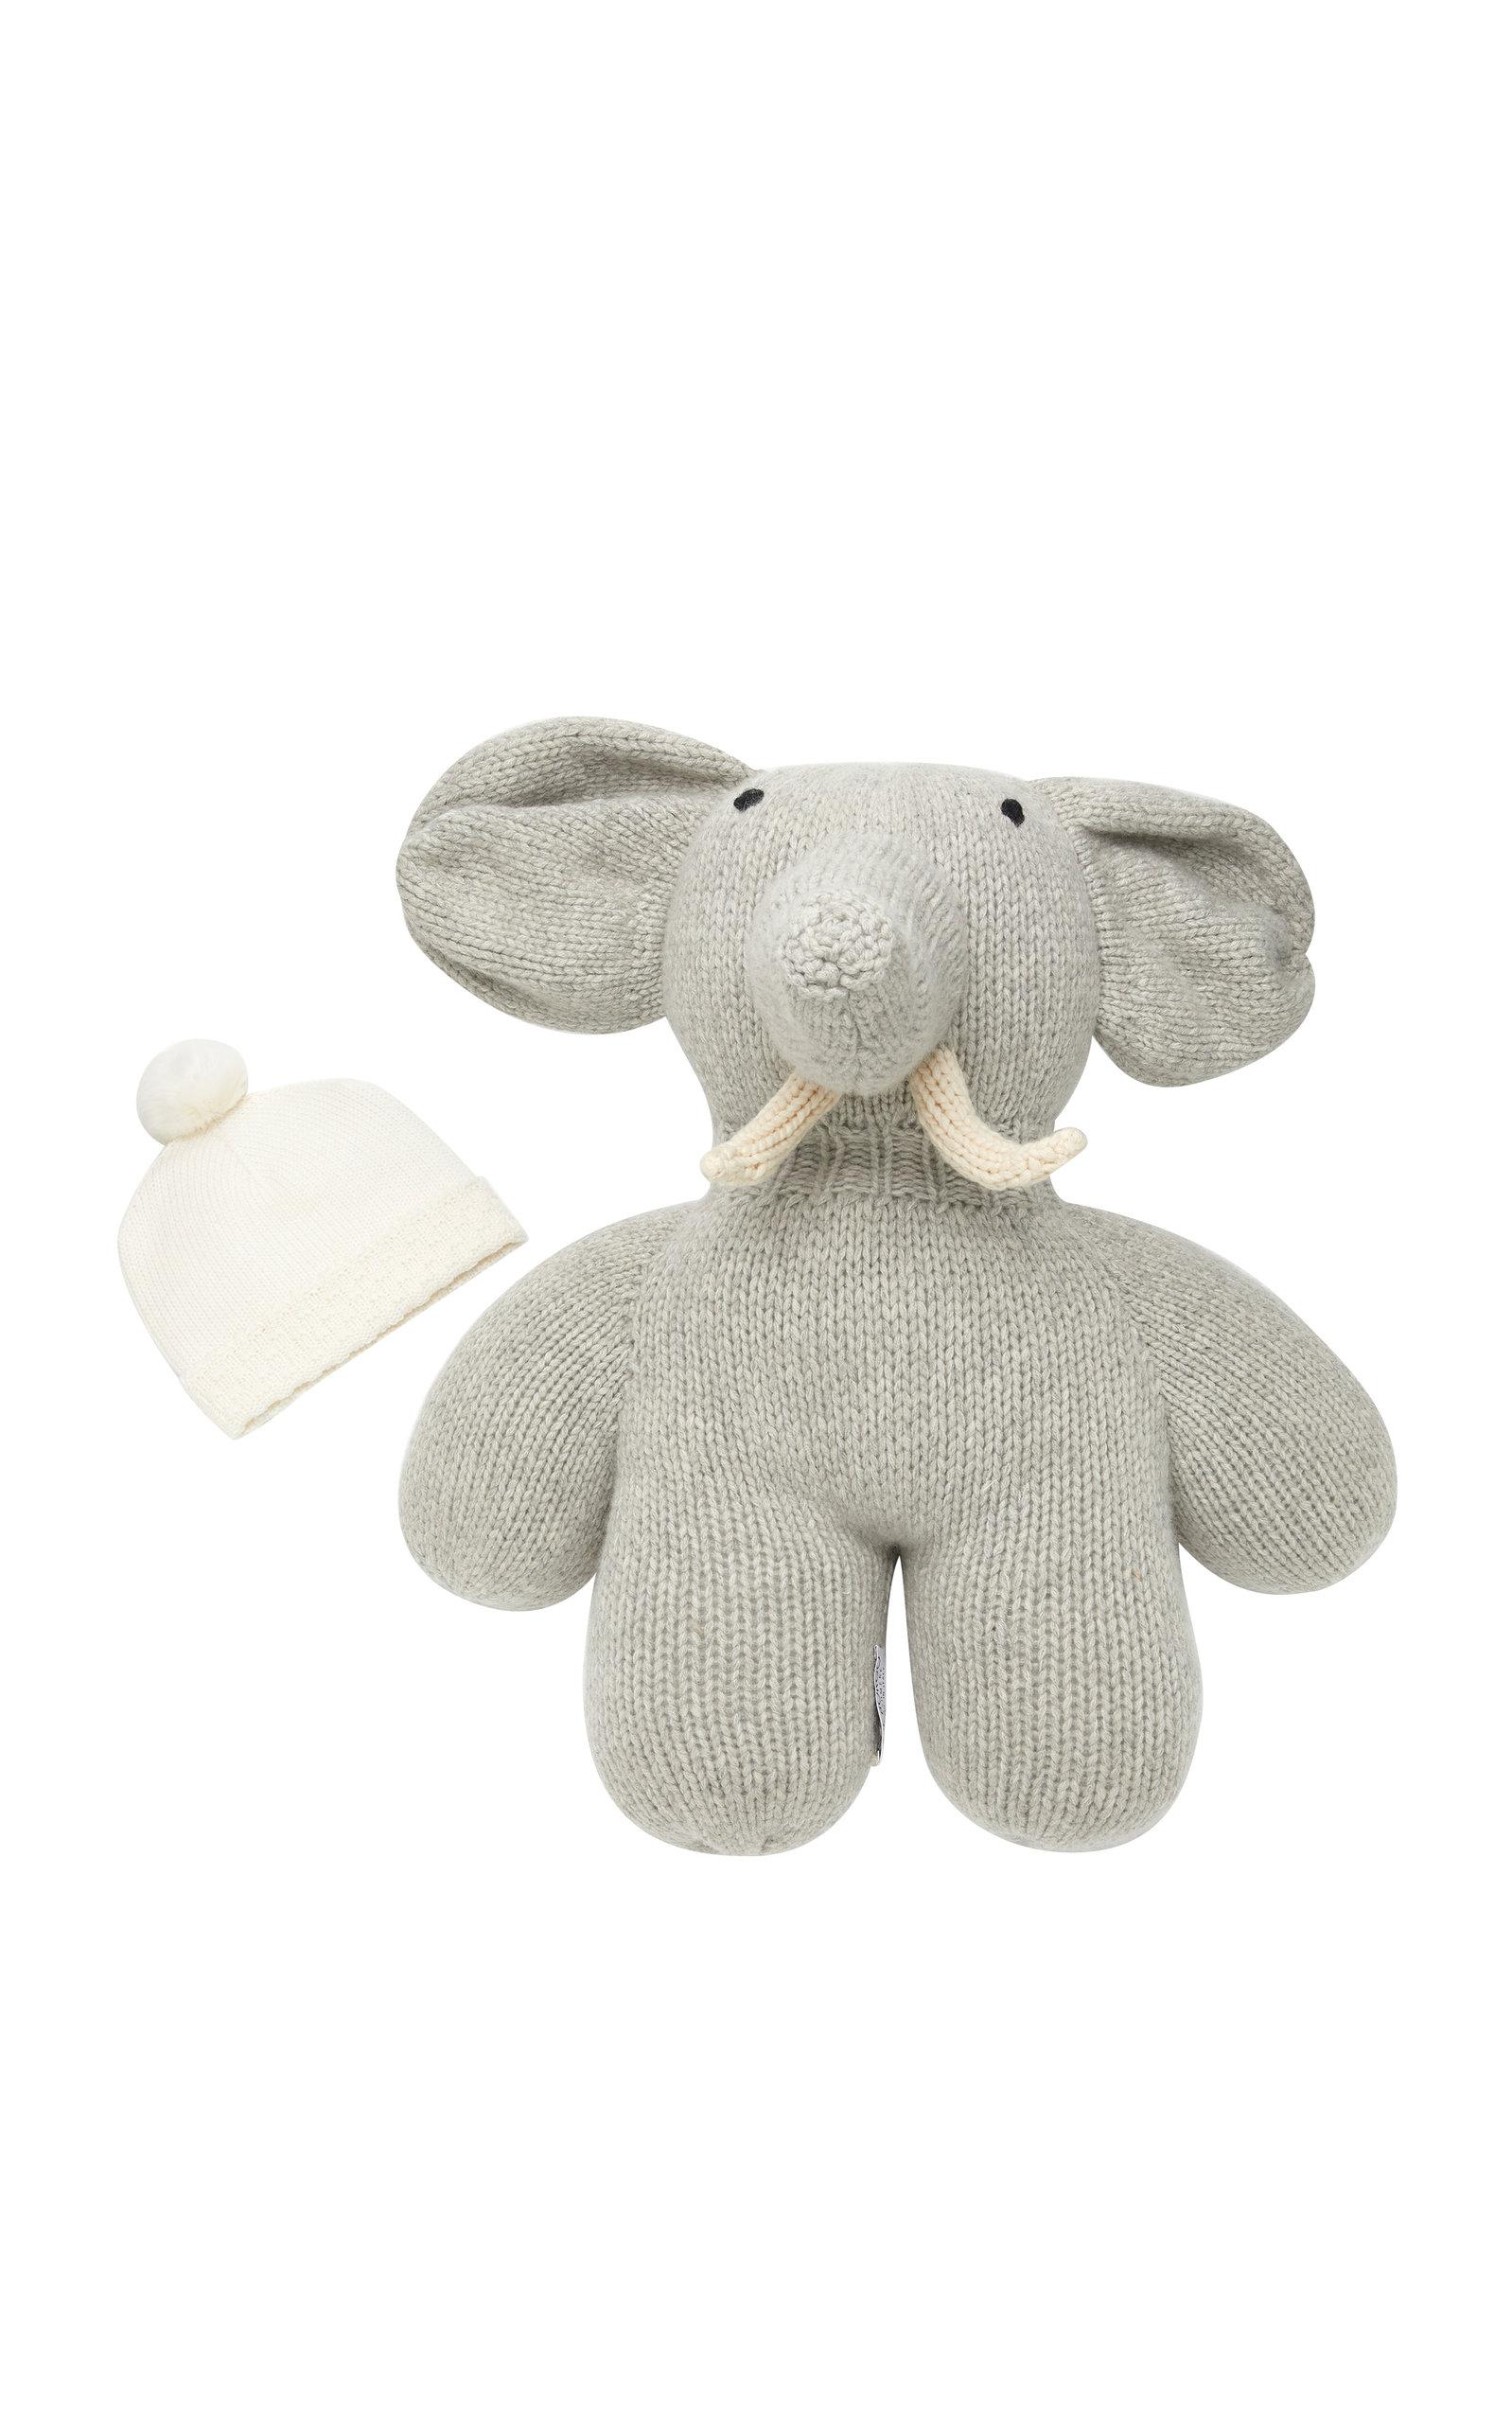 IL BORGO Infant Pom-Pom Hat And Elephant Cashmere Set in Neutral